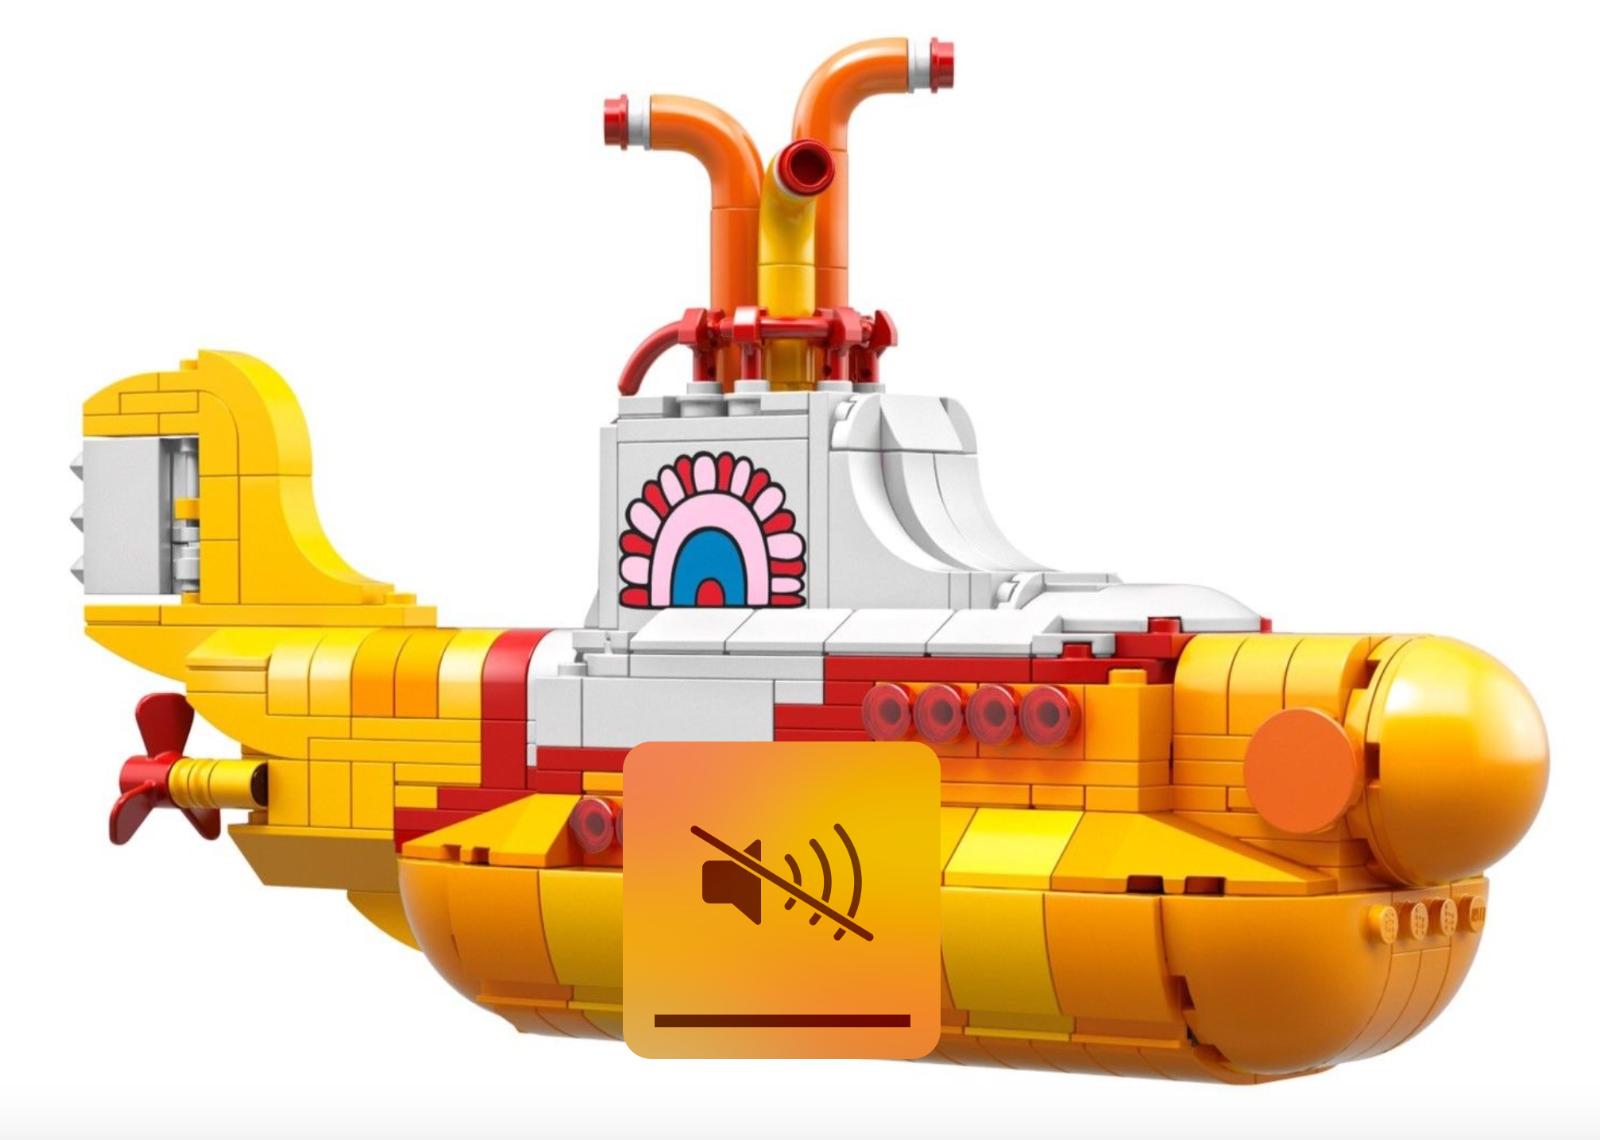 Lego 21306 Ideas The Beatles Gelb Submarine NO Minifigures